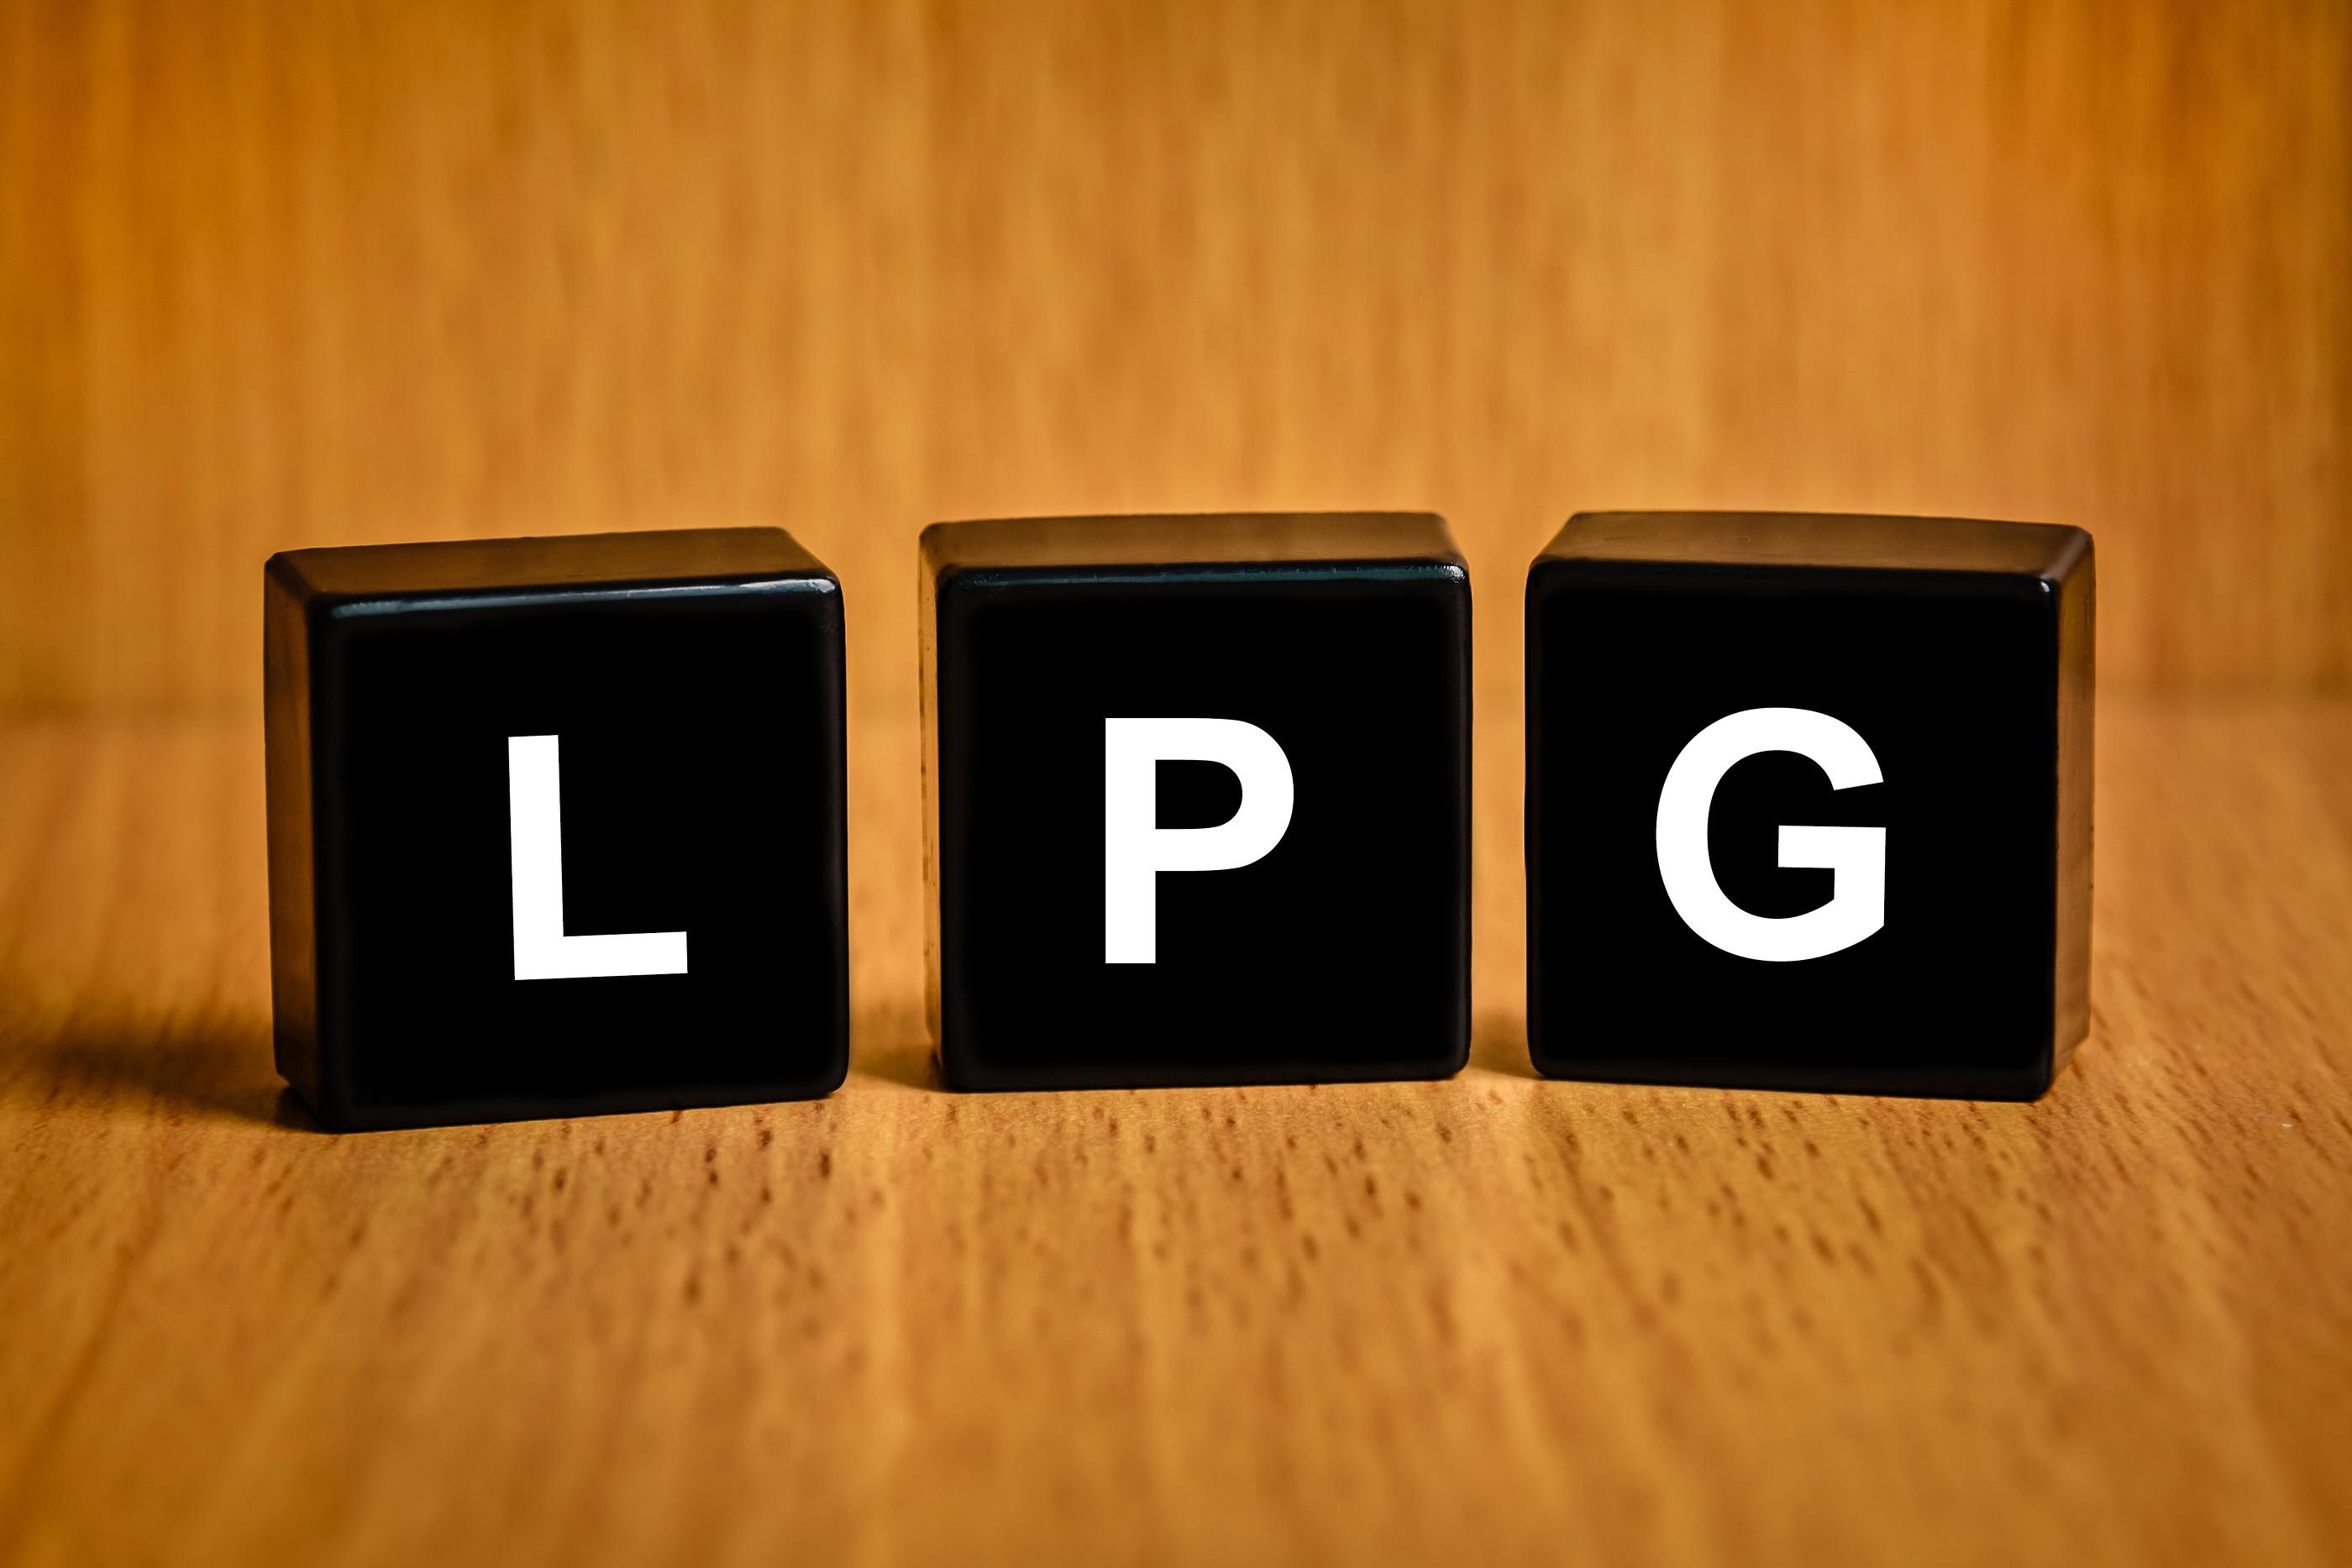 Instalacje LPG